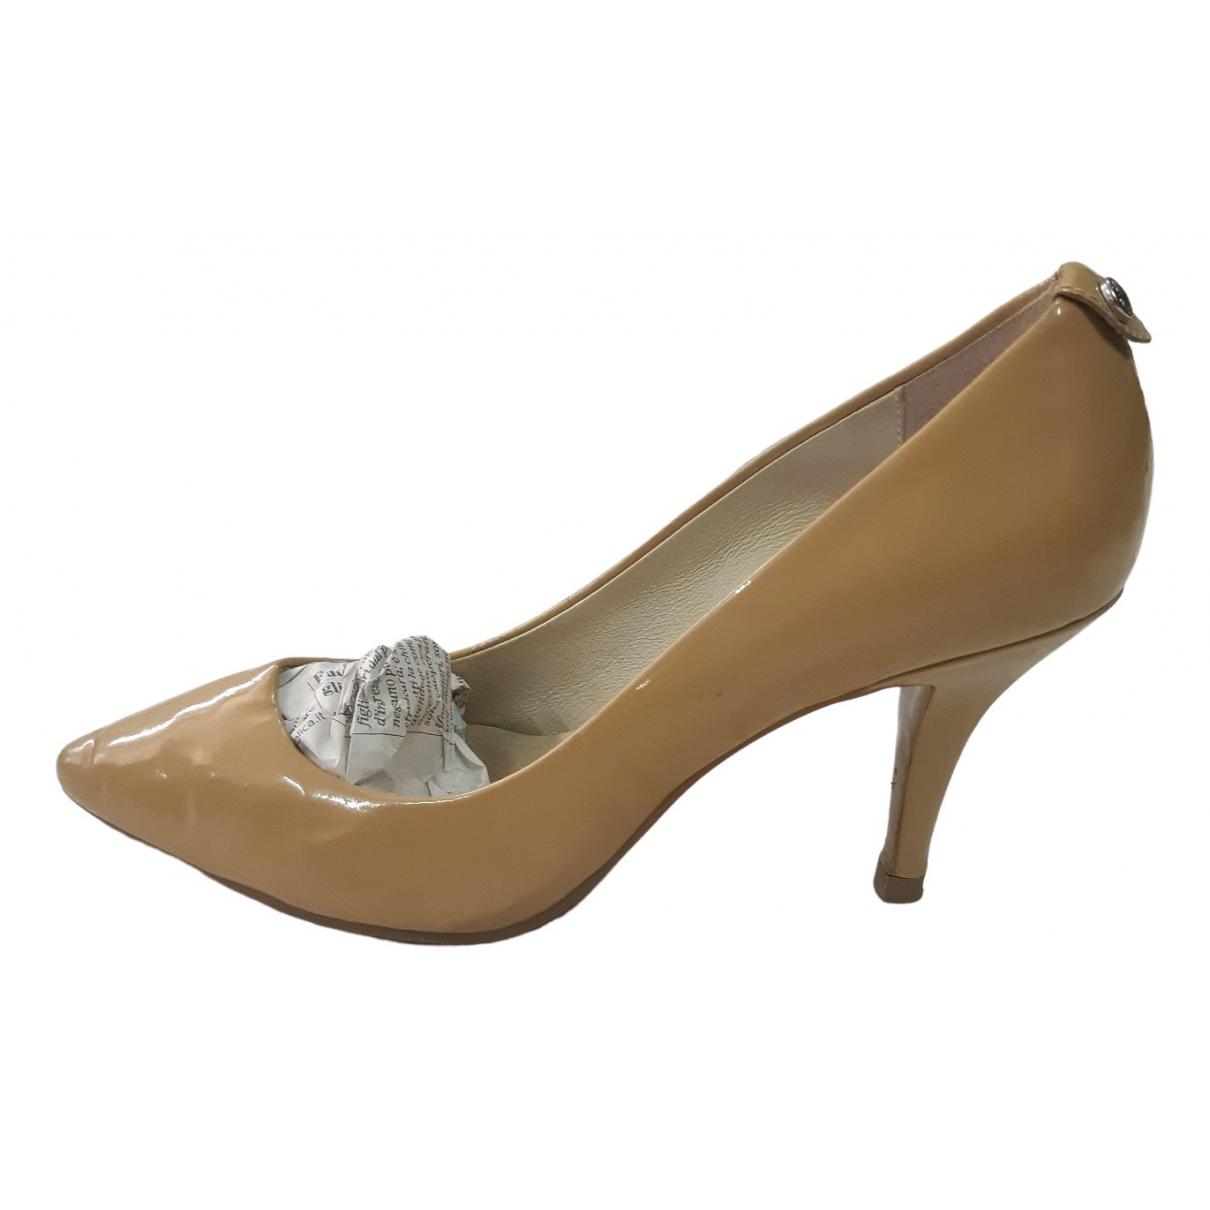 Michael Kors \N Patent leather Heels for Women 7 UK